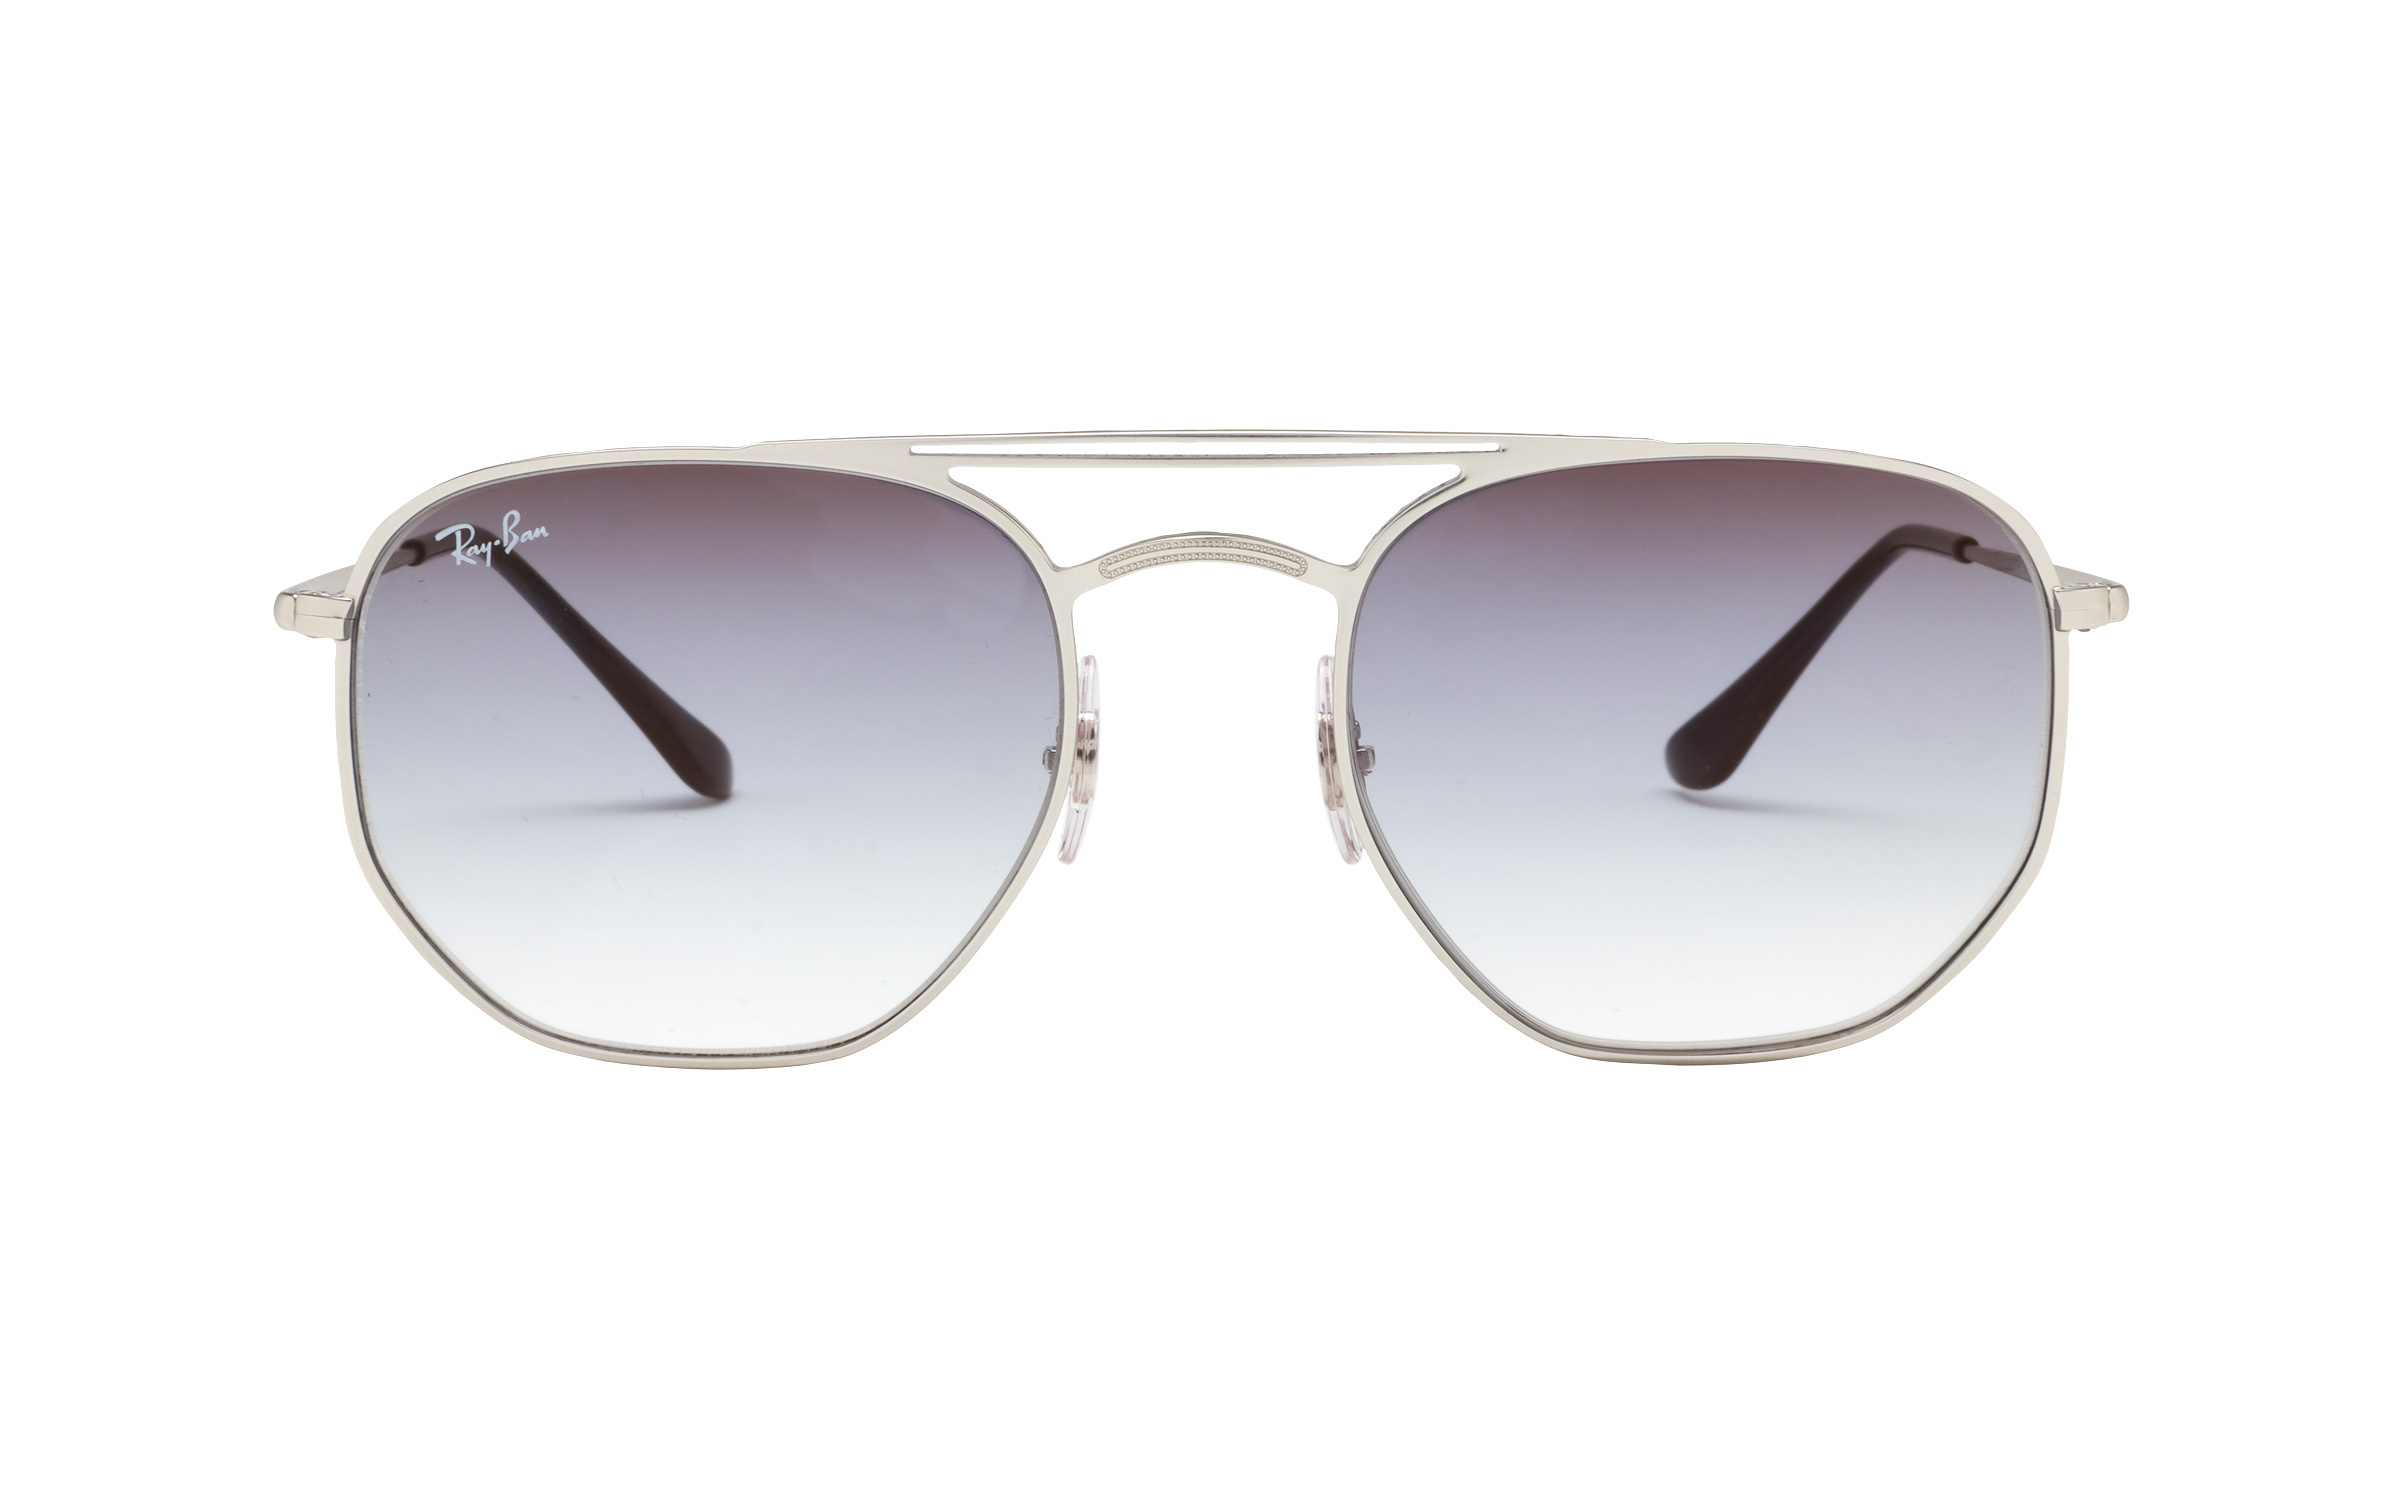 http://www.coastal.com/ - Luxottica Ray-Ban RB3609 9142/0S 54 Sunglasses in Silver | Plastic/Metal – Online Coastal